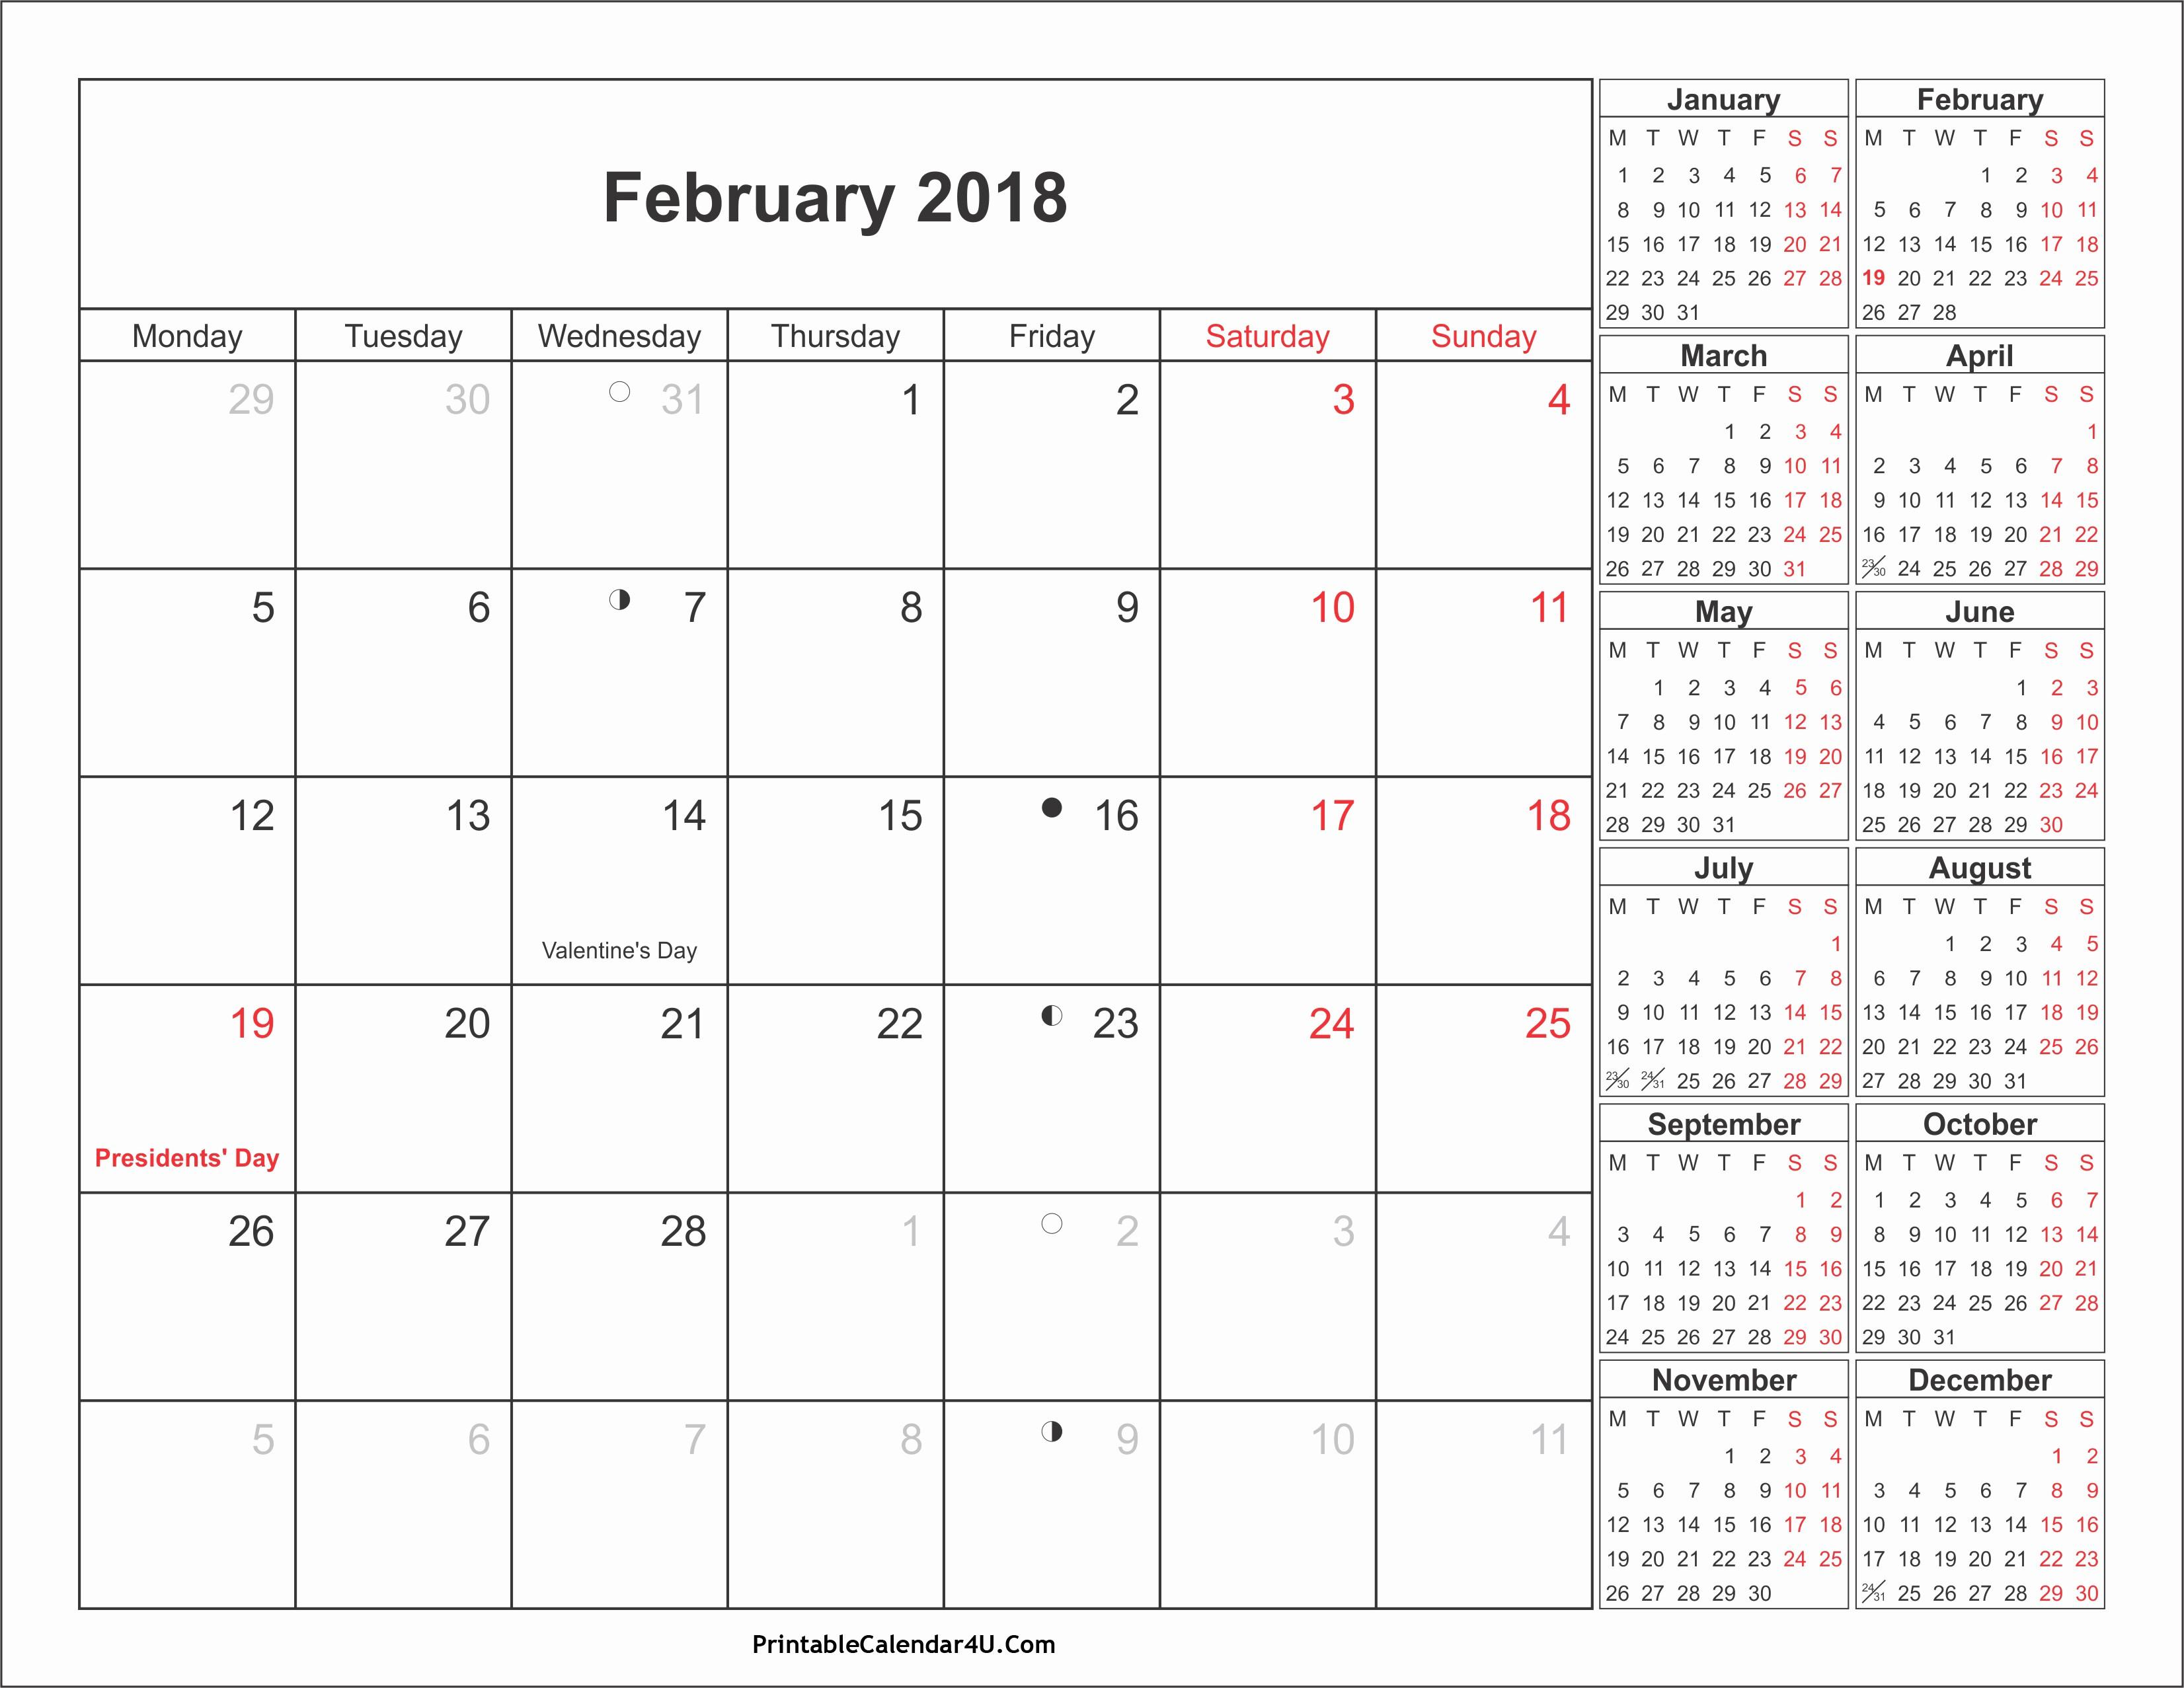 2017-2018 Printable Calendar Beautiful February 2018 Calendar Printable with Holidays